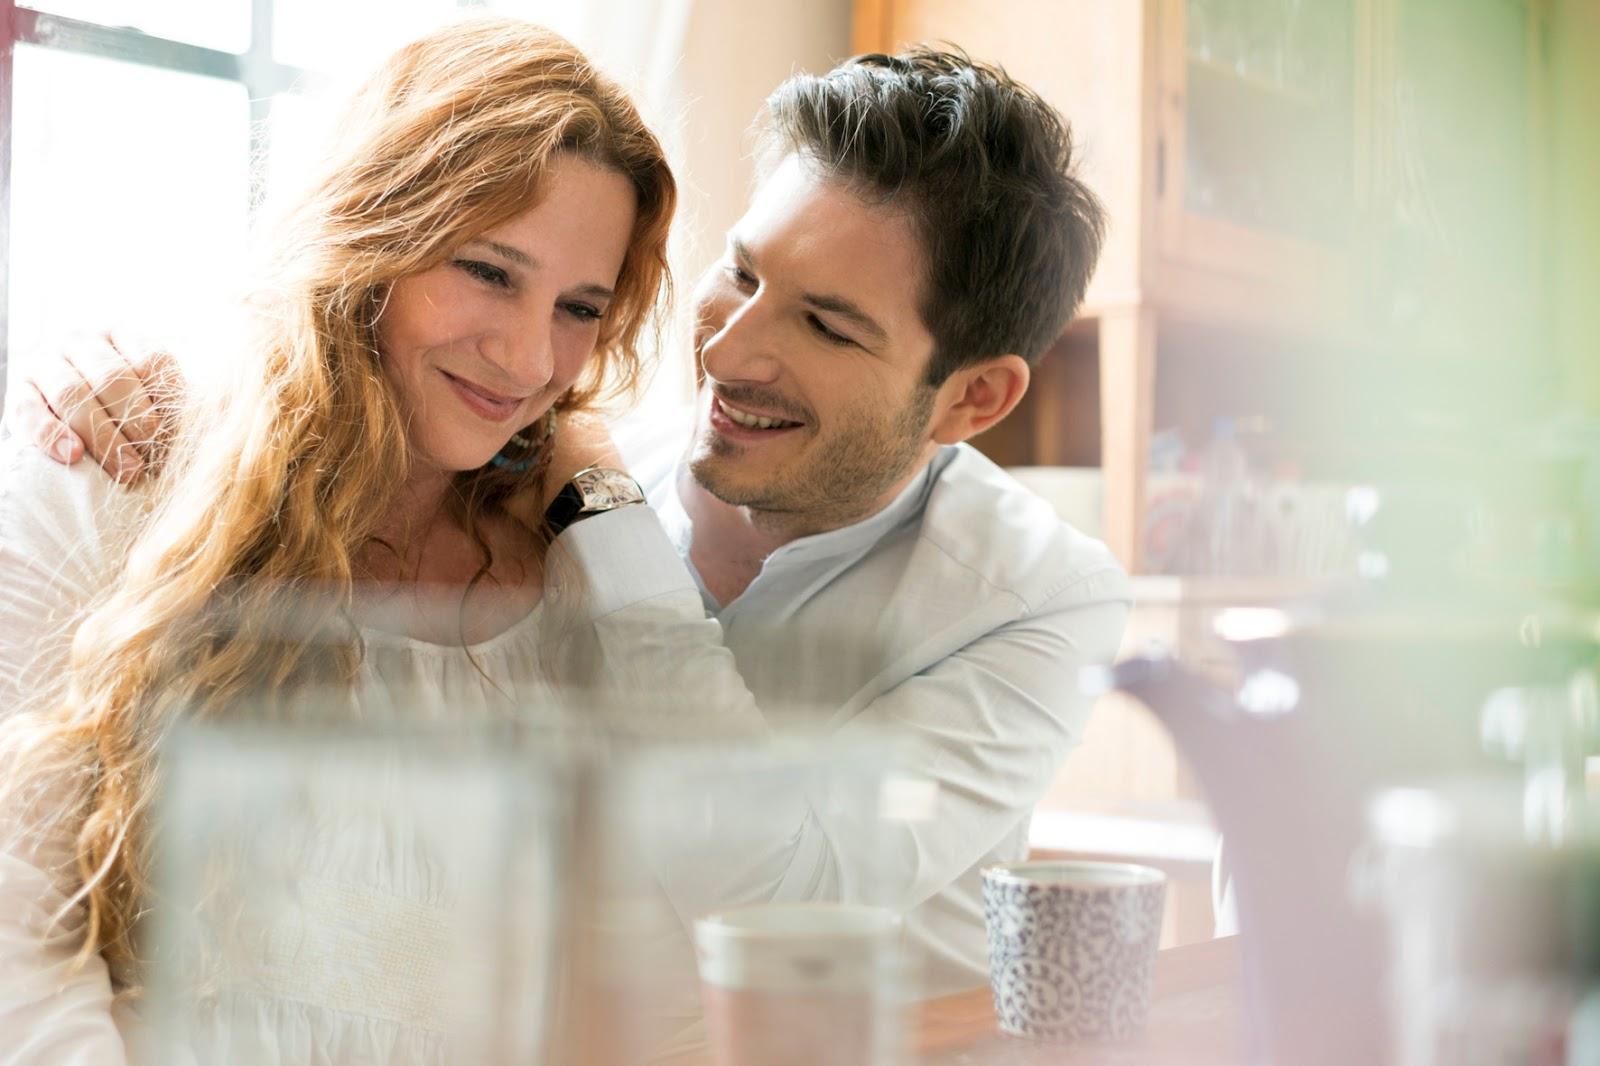 Dating πλούσιο κορίτσι Yahoo ανύπαντρος άντρας που βγαίνει με μια παντρεμένη γυναίκα